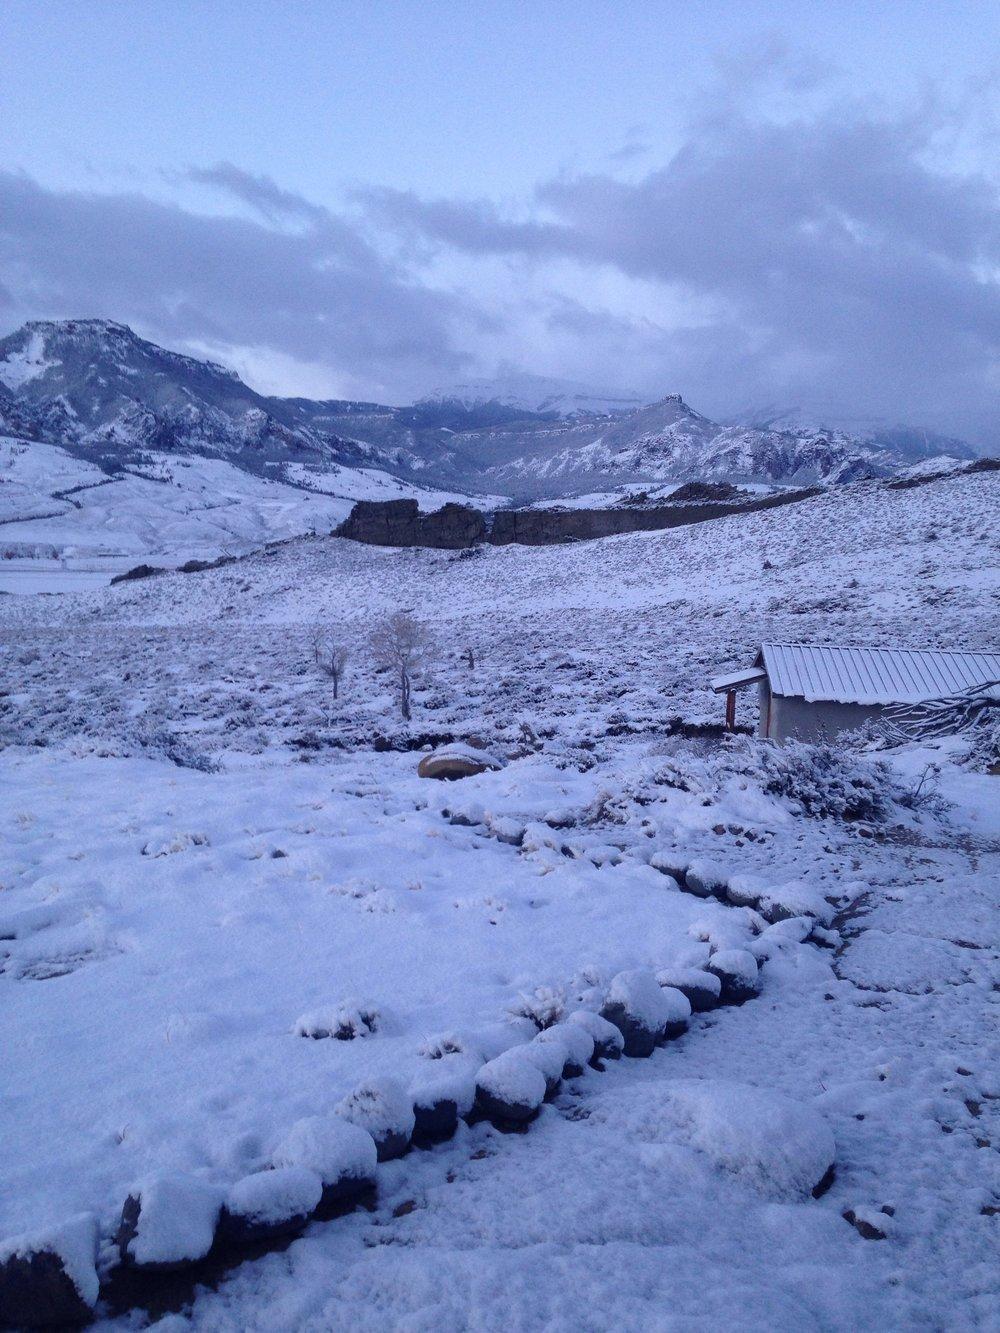 Ptarmigan Mountain, Wapiti, Wyoming, April 2, 2017, writer's cabin in foreground.